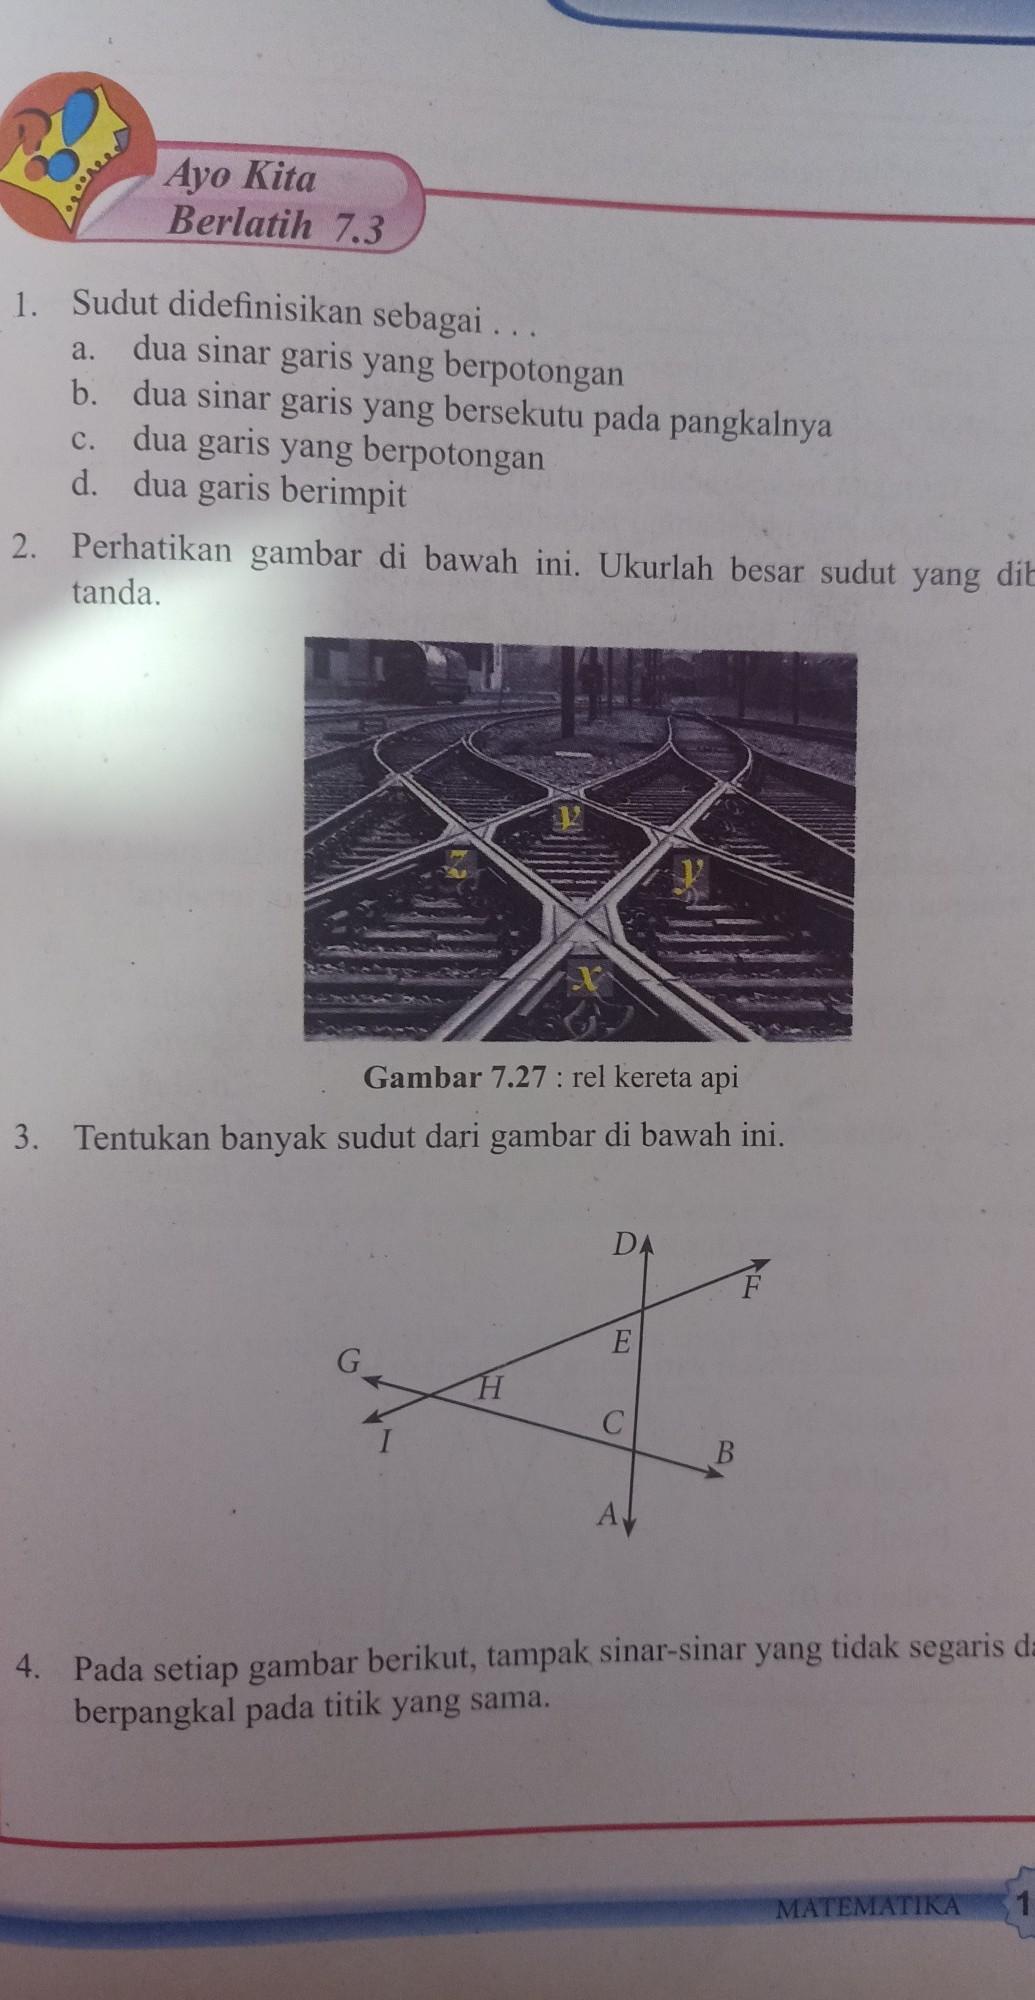 Jawaban Matematika Kelas 7 Semester 2 Halaman 139 No 1 11